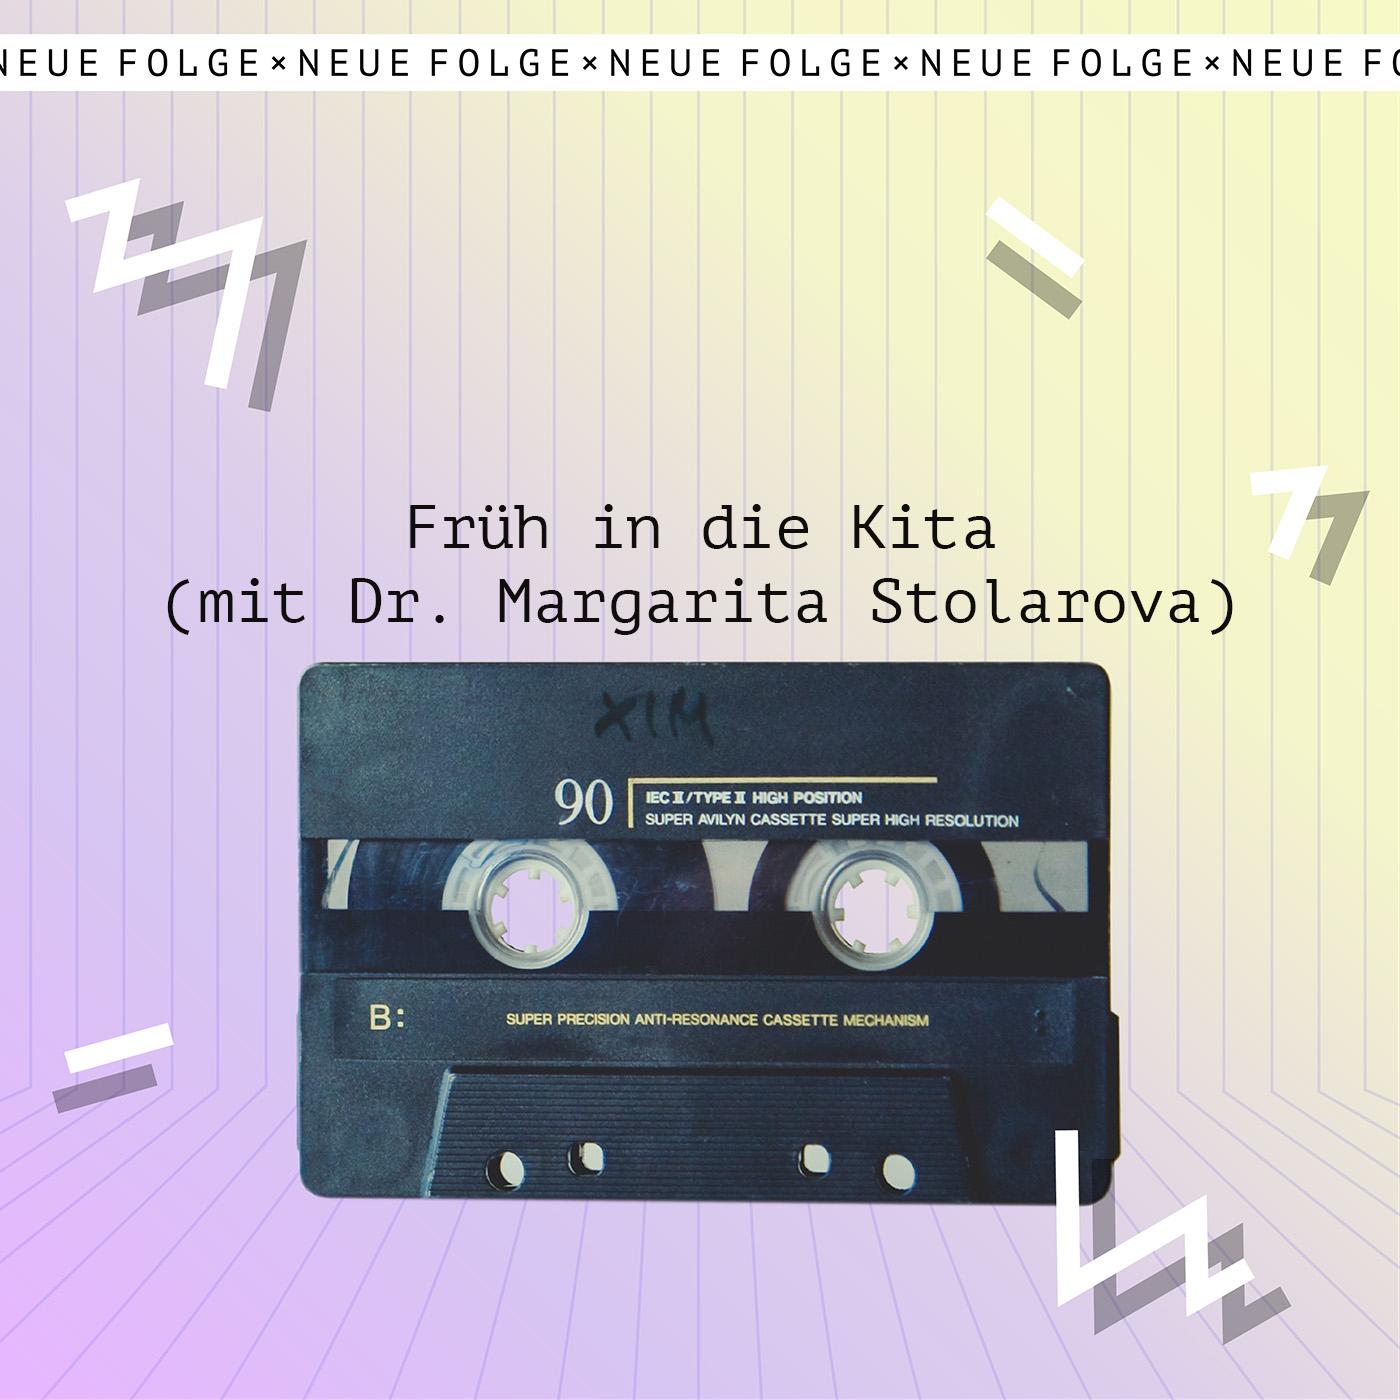 Früh in die Kita (mit Dr. Margarita Stolarova)